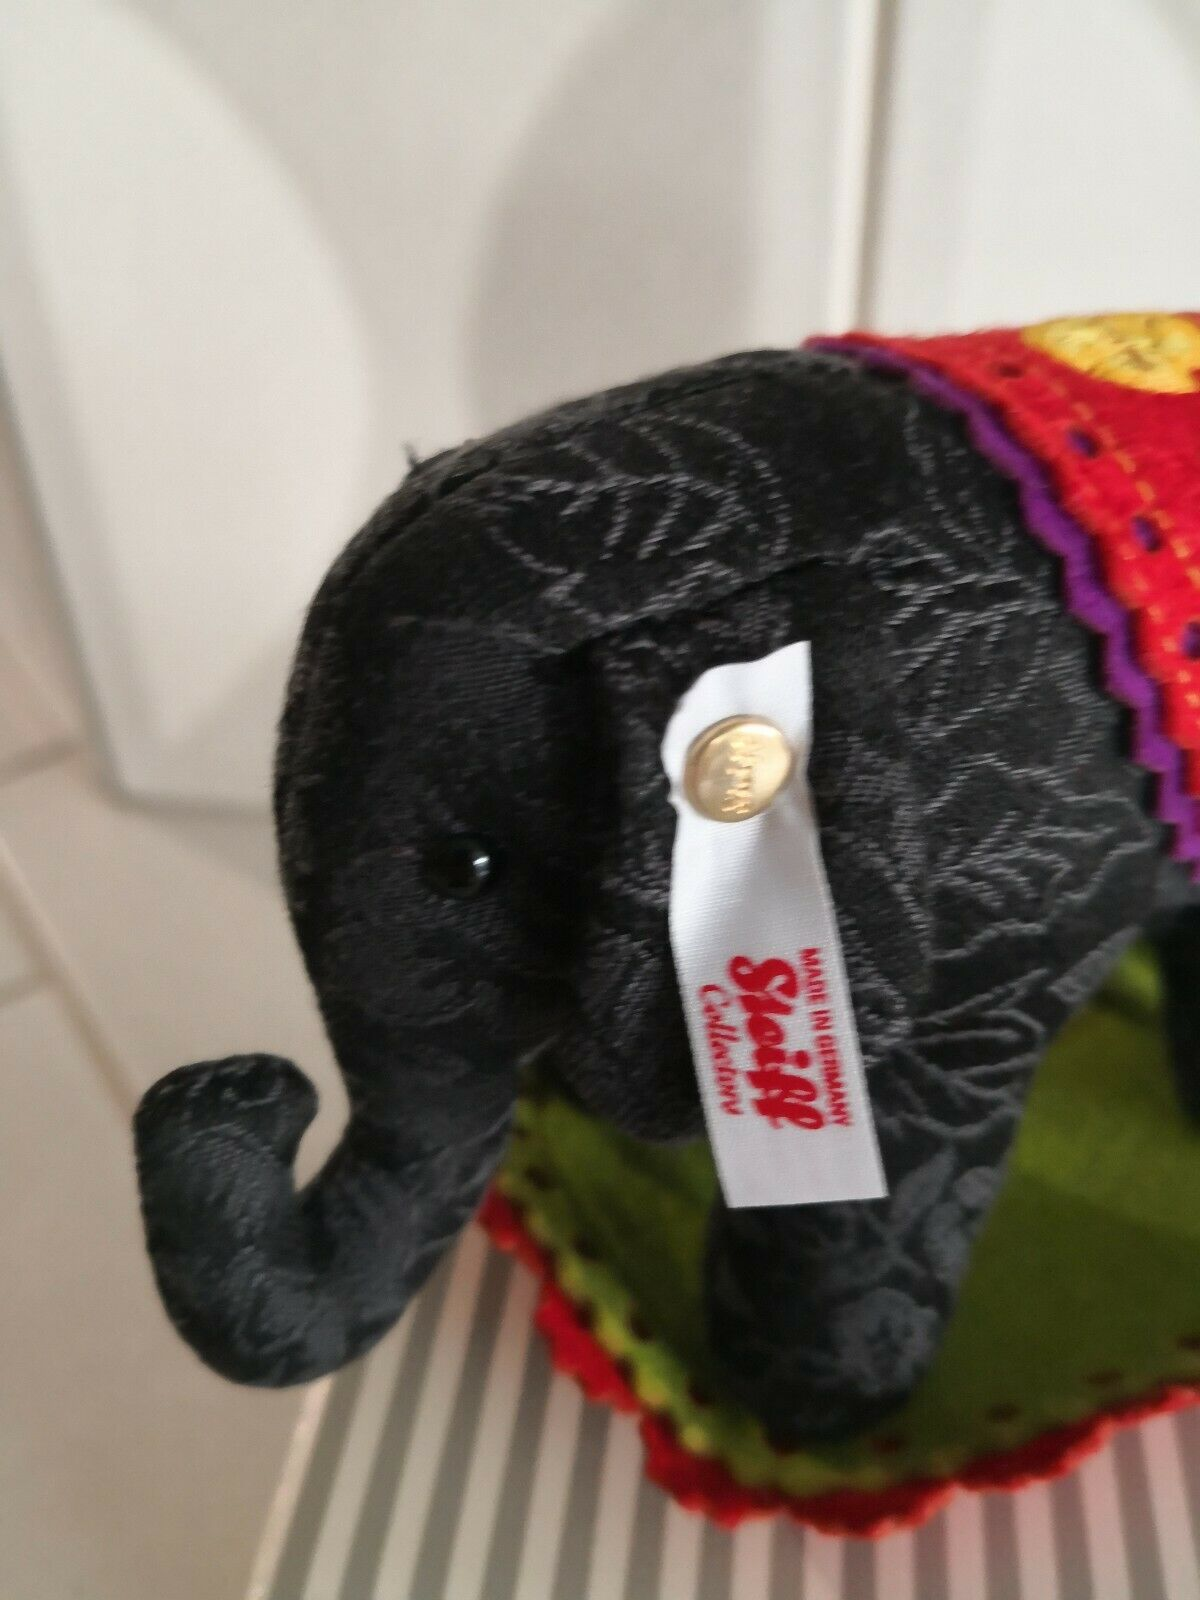 Sammler Steiff 040313 Anhänger UVP 69,90 € Tiny Maus 10 cm Mohair  *Brandneu